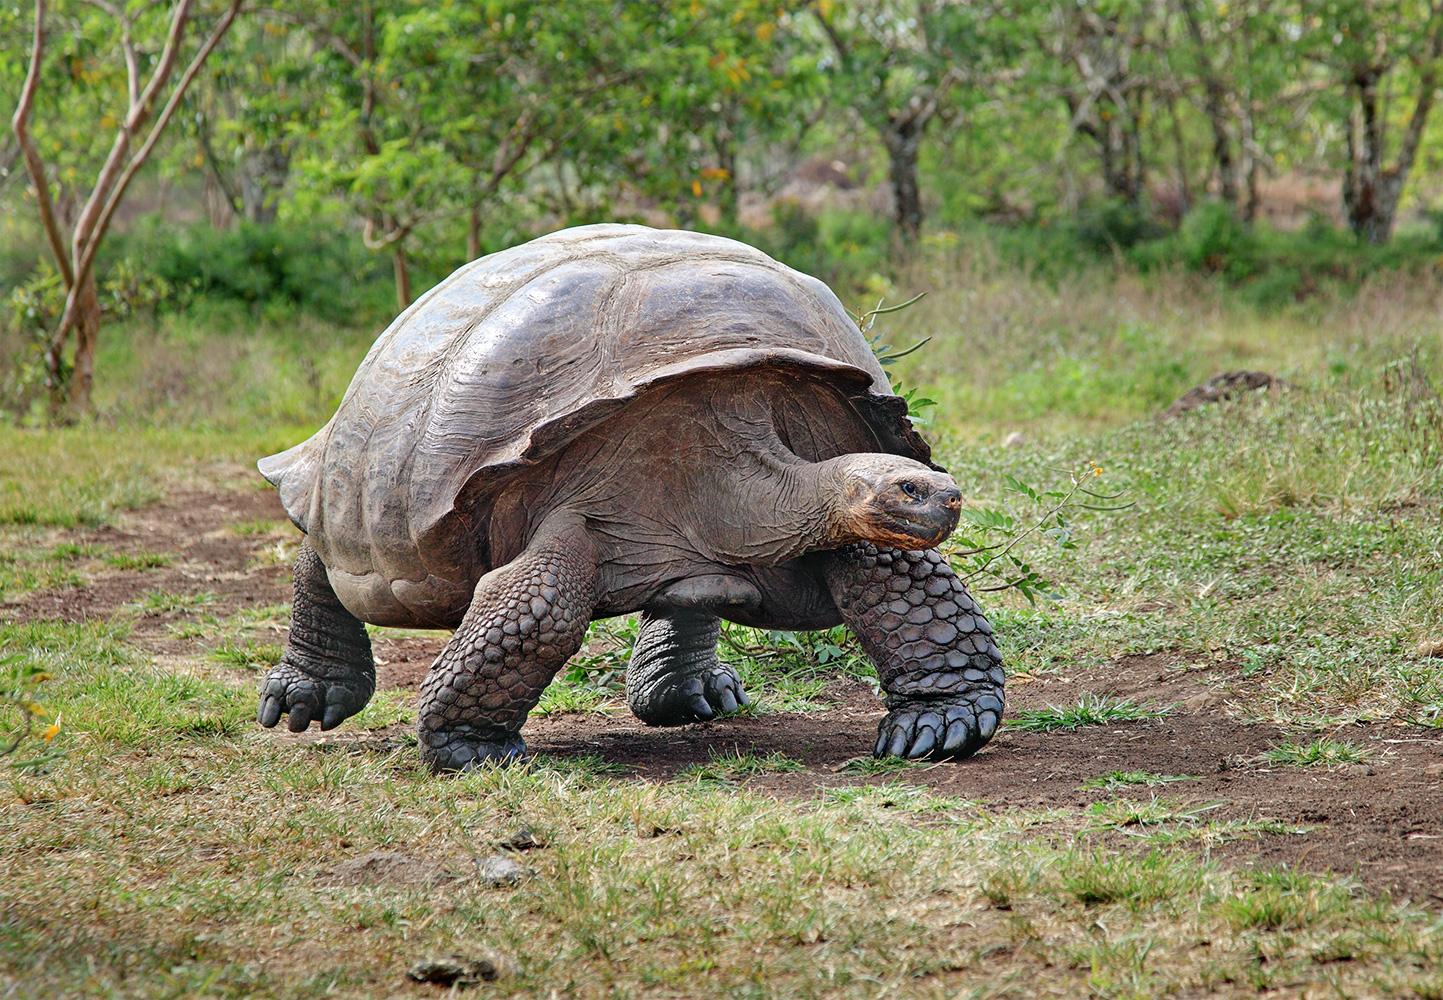 Ecuador, Galapagos Islands, Tortoise Reserve, Giant Tortoise